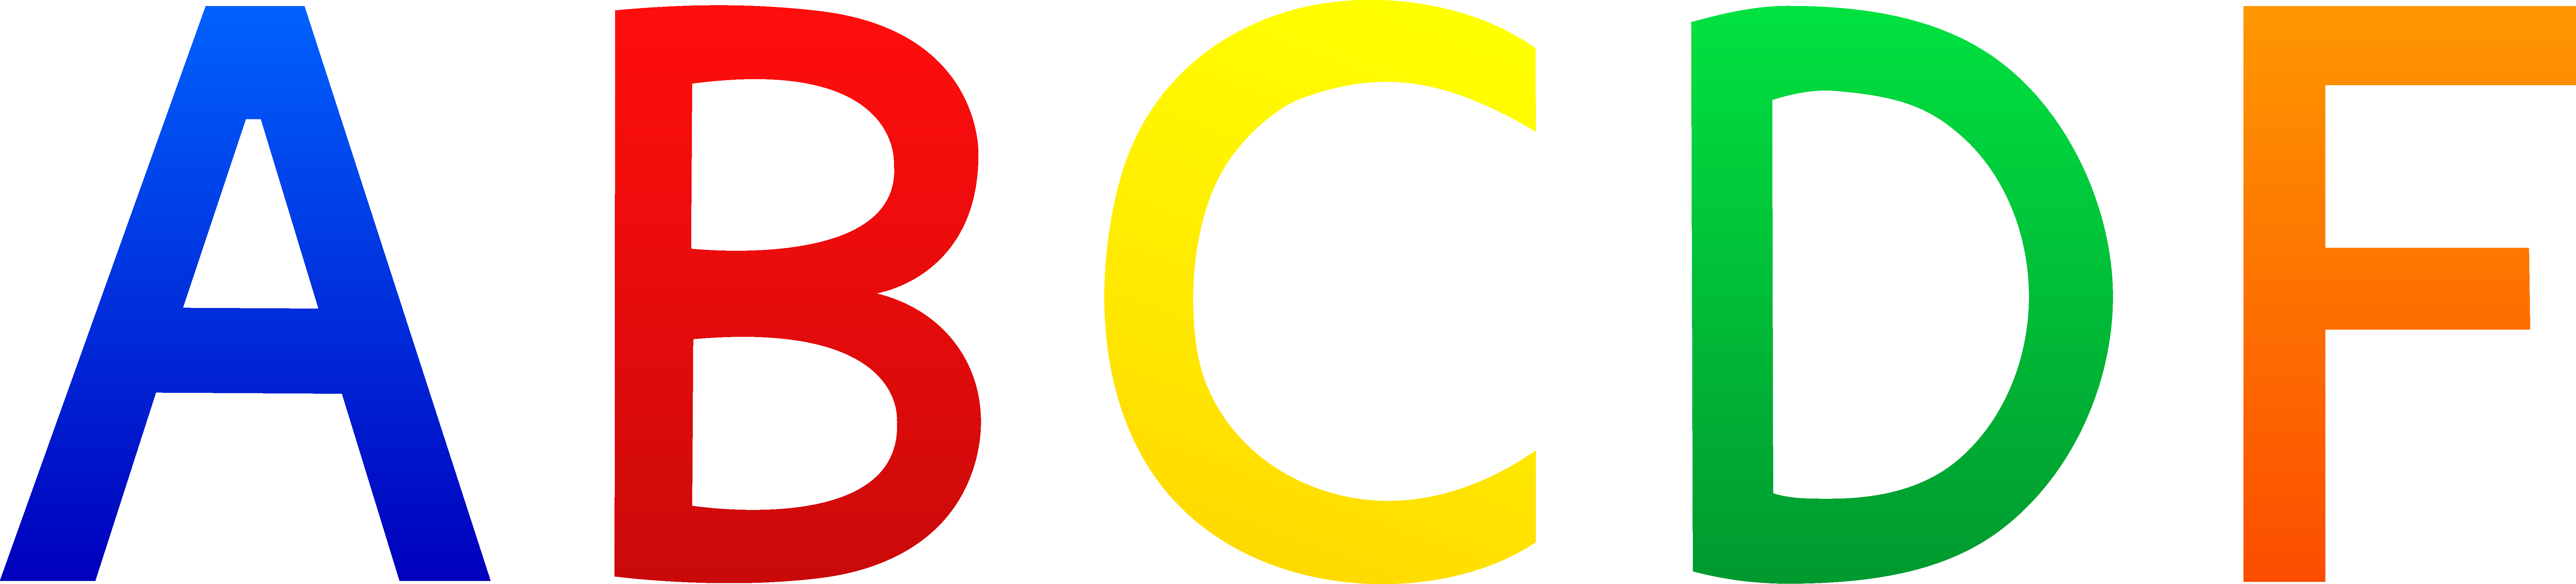 Alphabet Letter Clipart